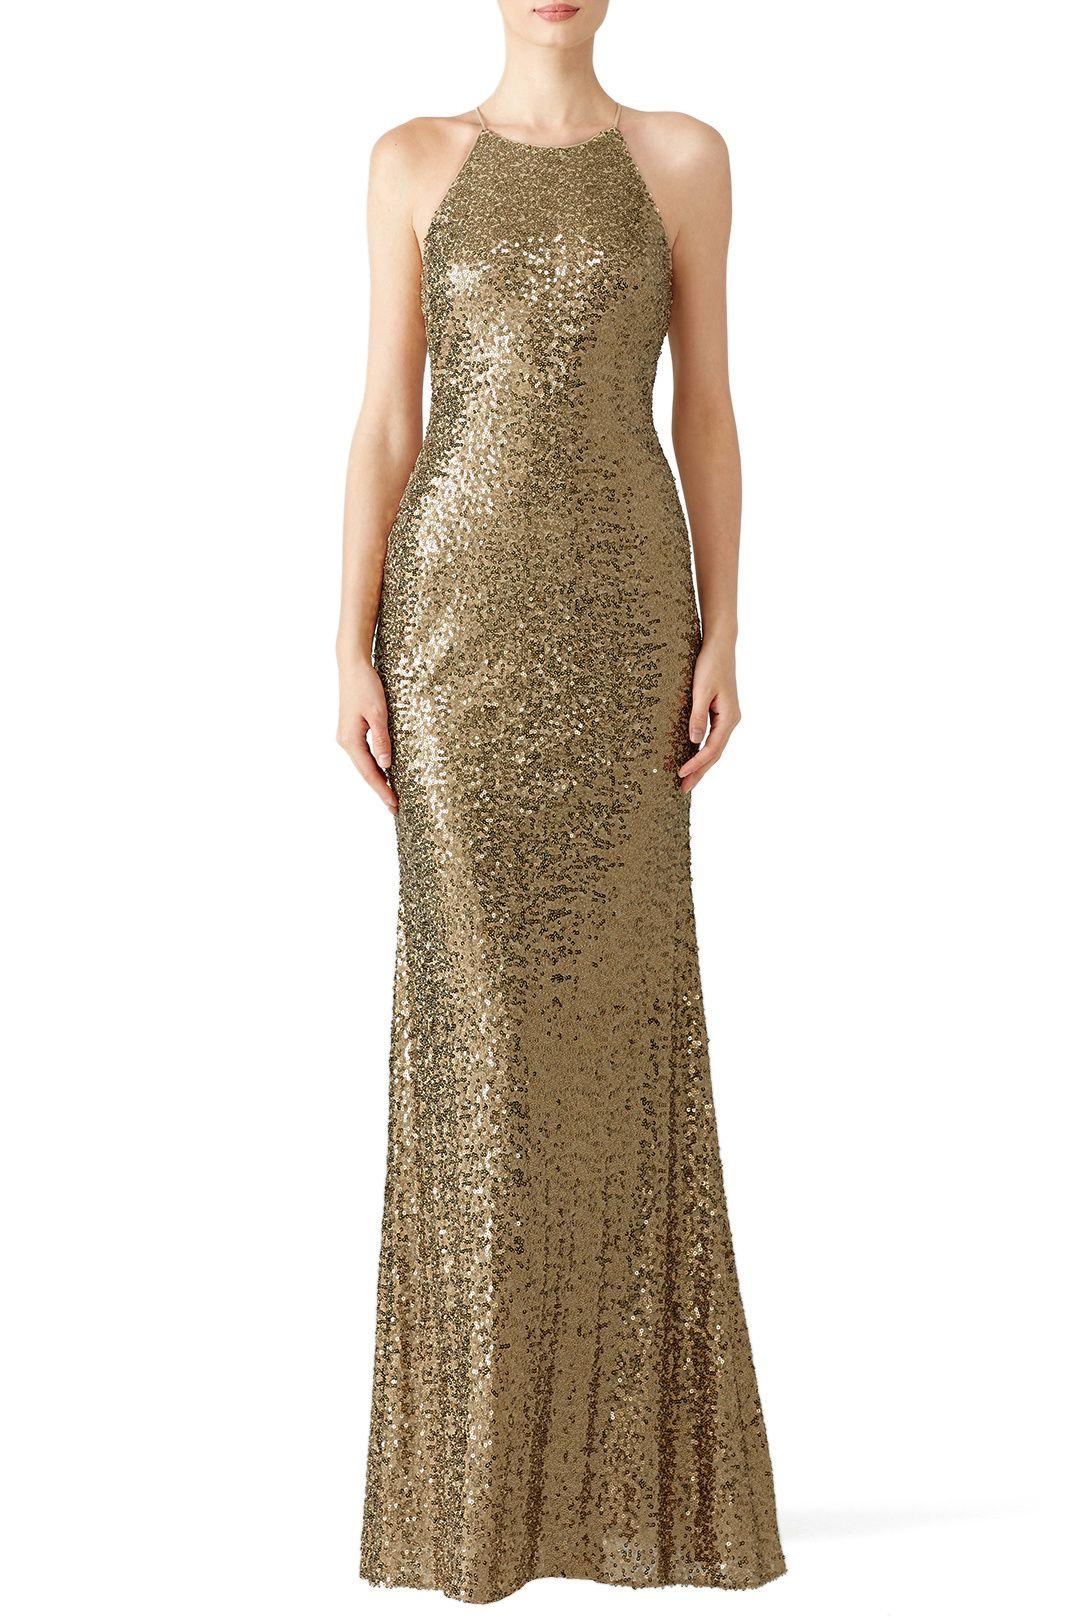 Gold Sequin Halter Gown | Someday.... | Pinterest | Halter gown ...